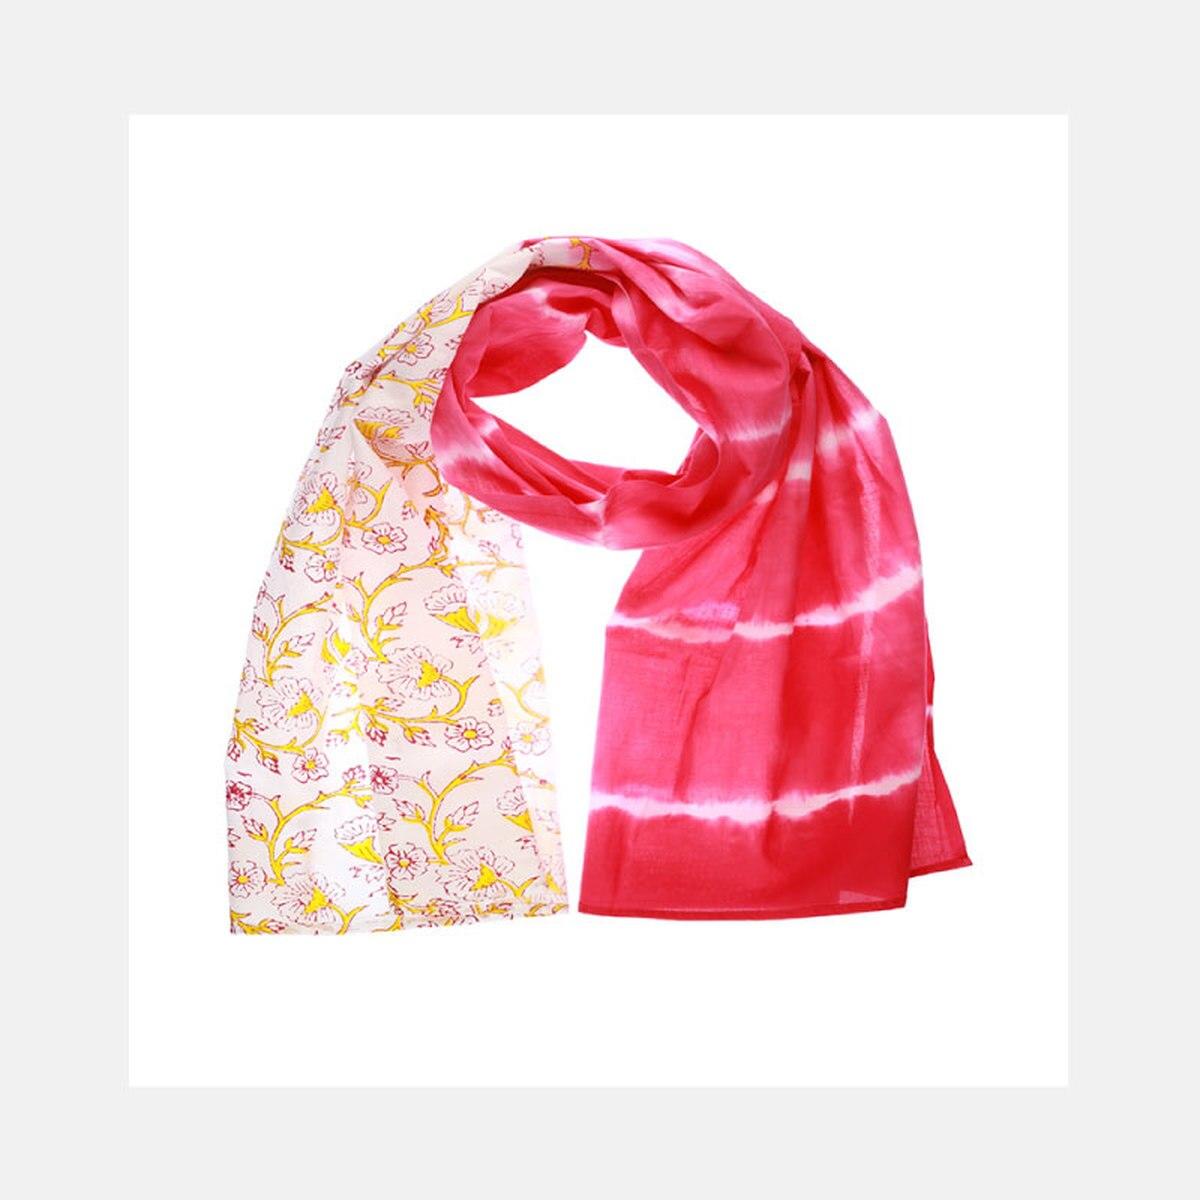 Hand Block - Pink Scarf from Siyana London